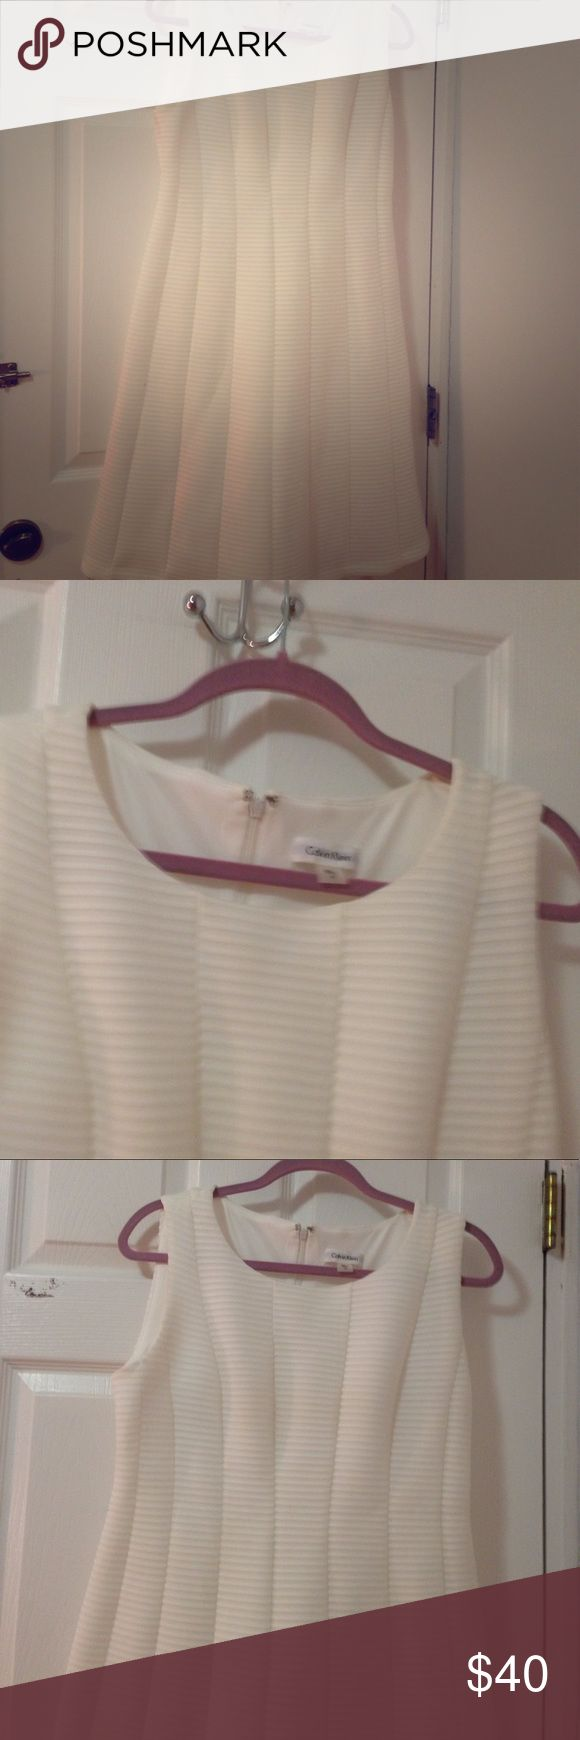 White dresss Calvin Klein 10 Dress Calvin Klein near new Calvin Klein Dresses